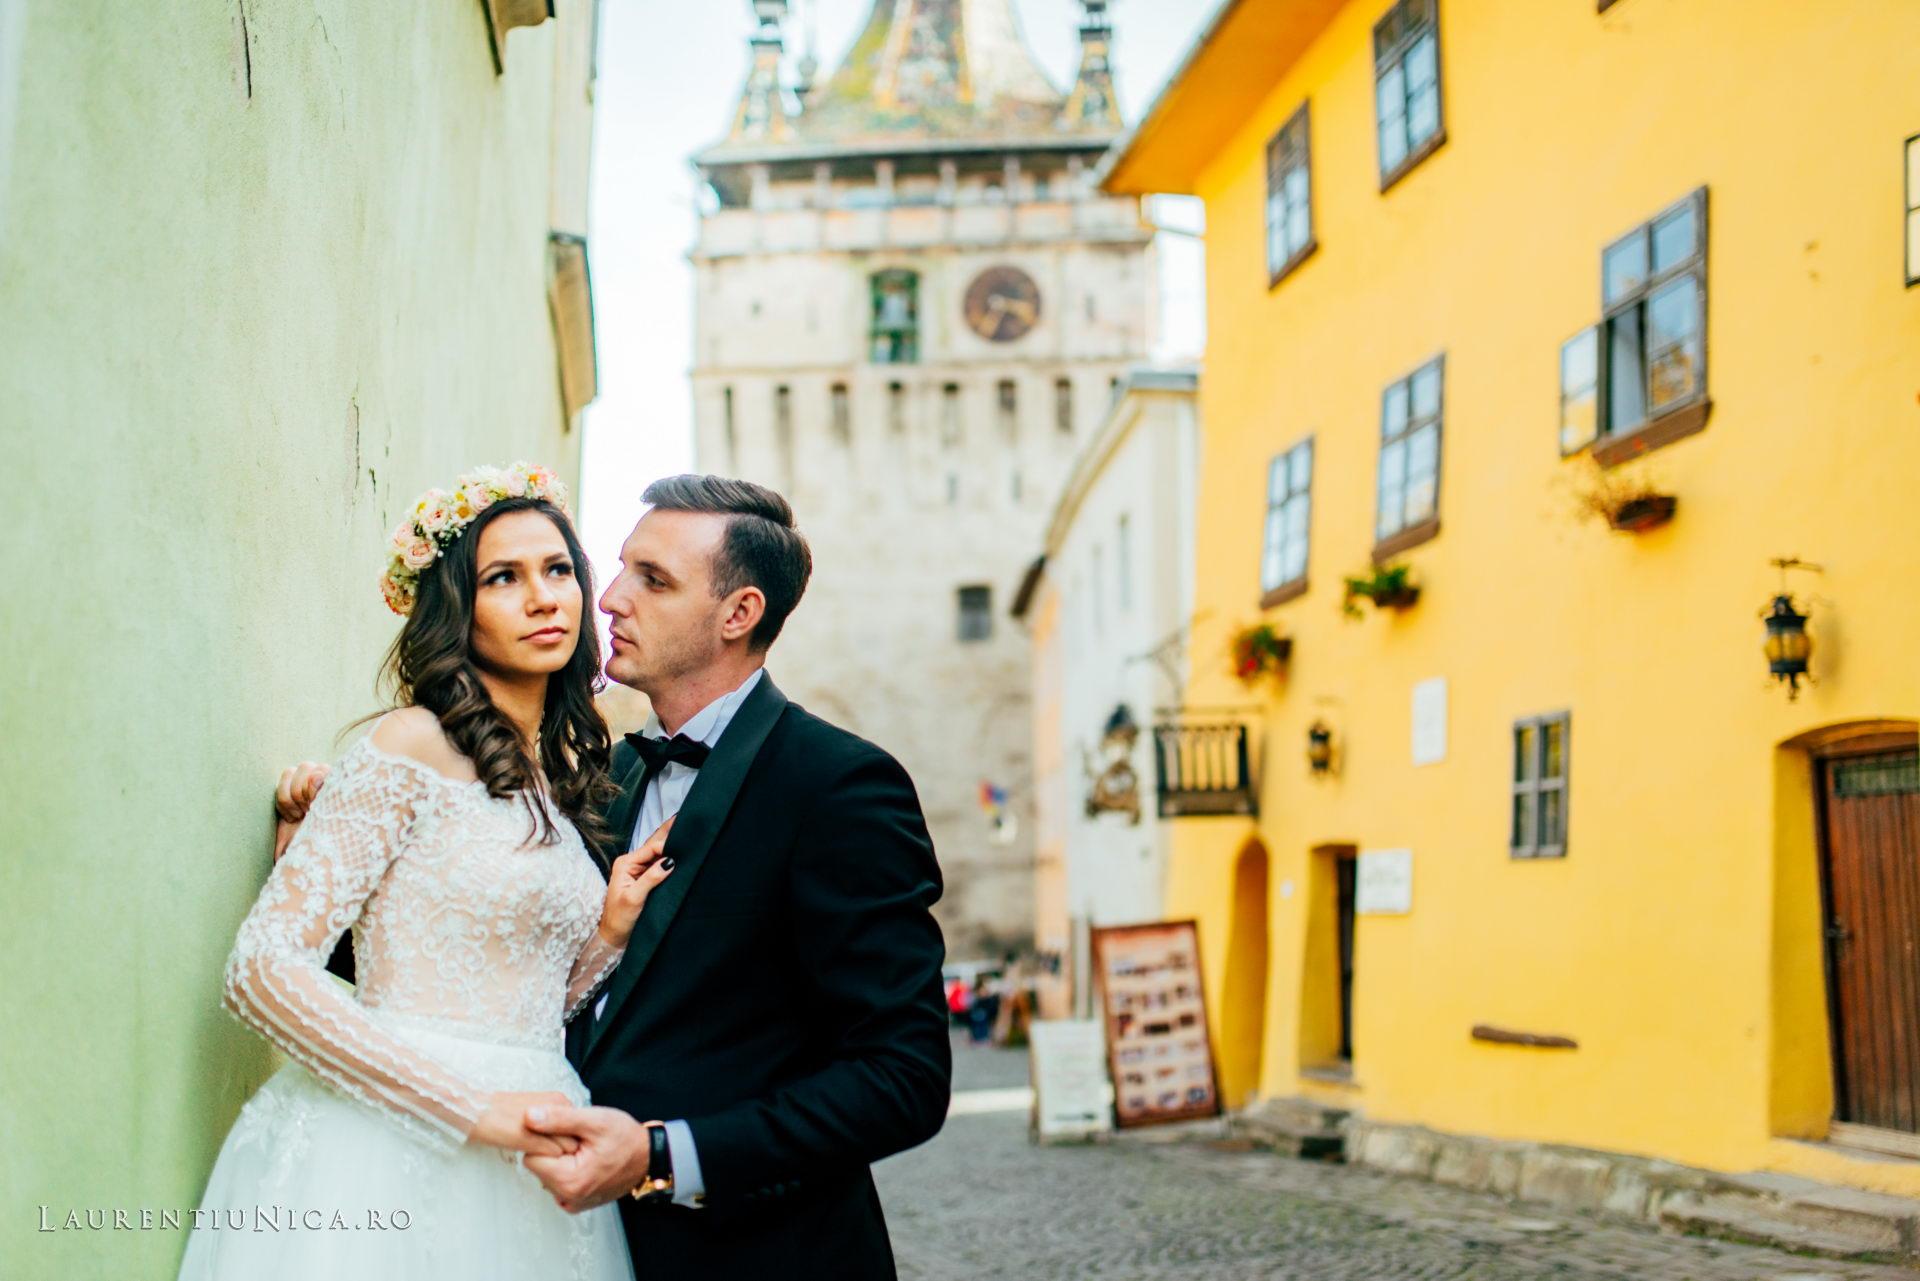 lili-si-dan-fotografii-nunta-after-wedding-sighisoara-laurentiu-nica16